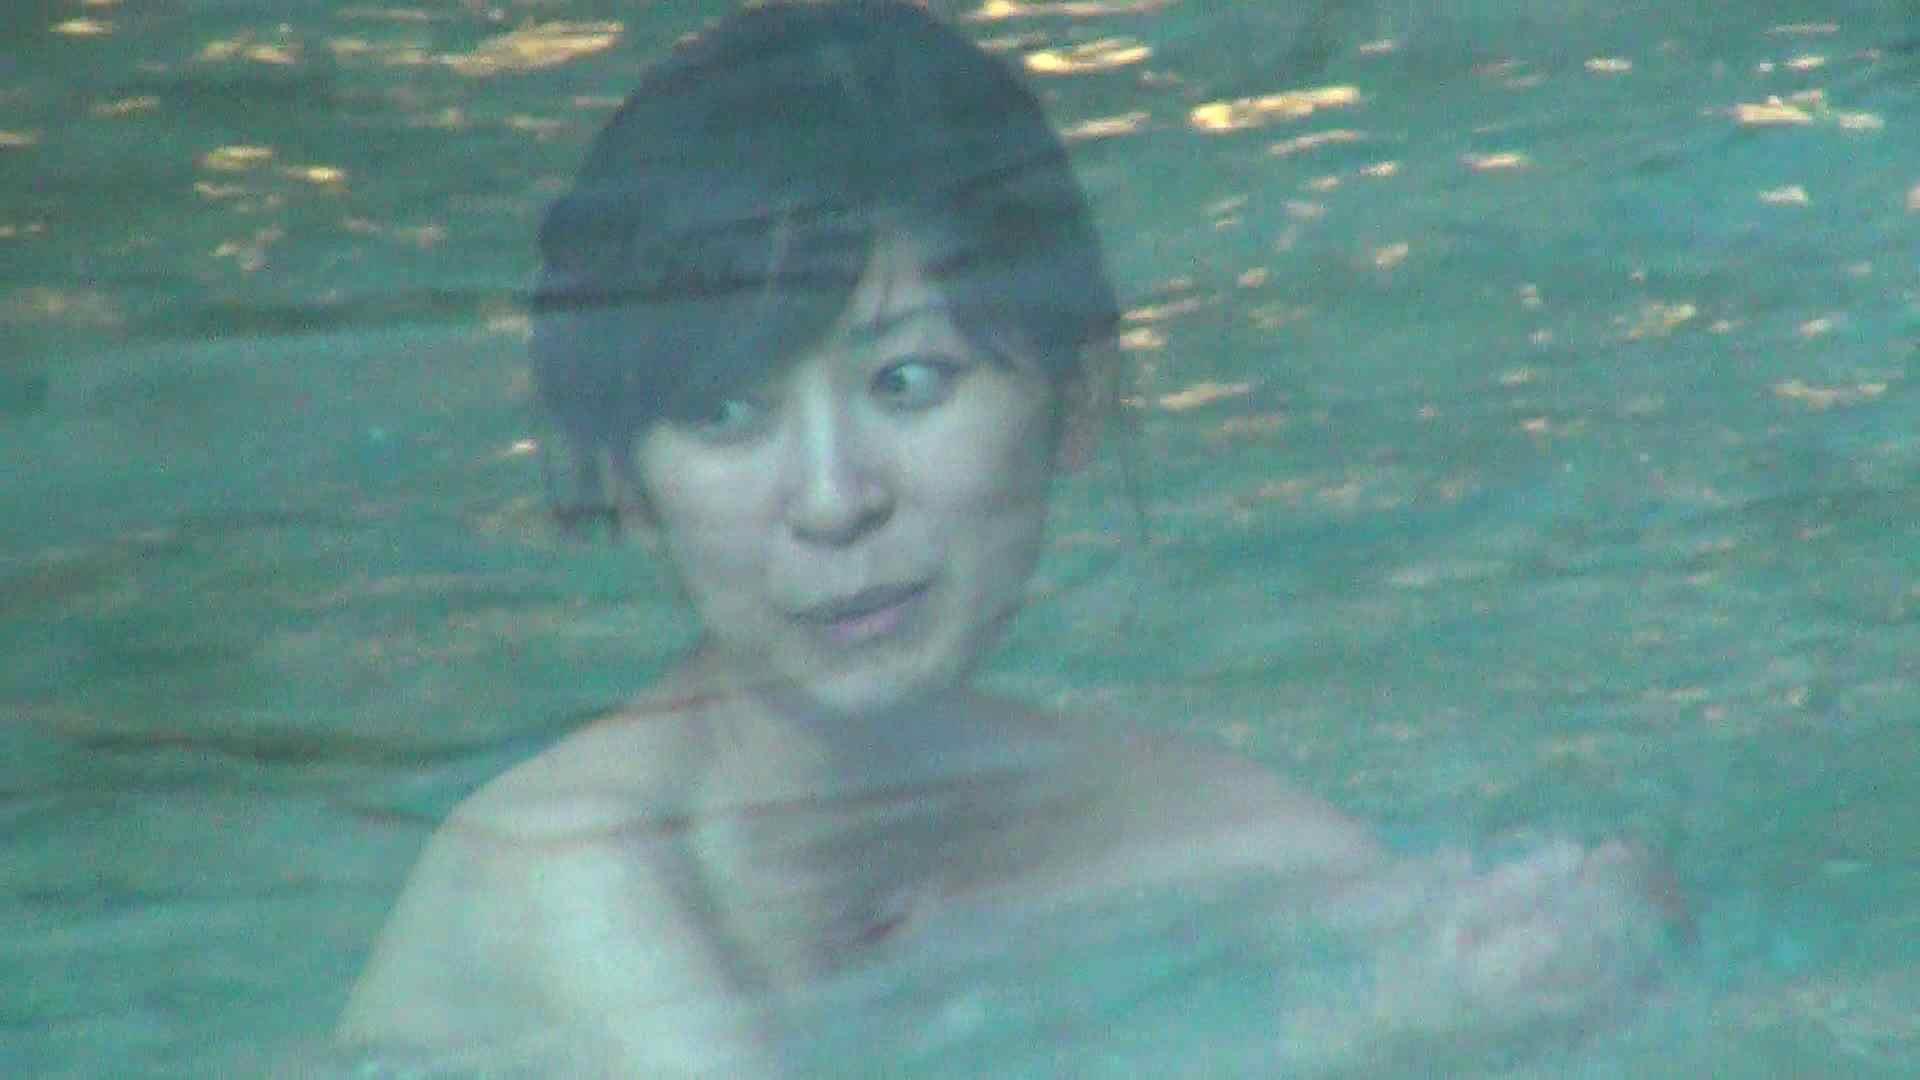 Aquaな露天風呂Vol.294 OLセックス  75画像 57